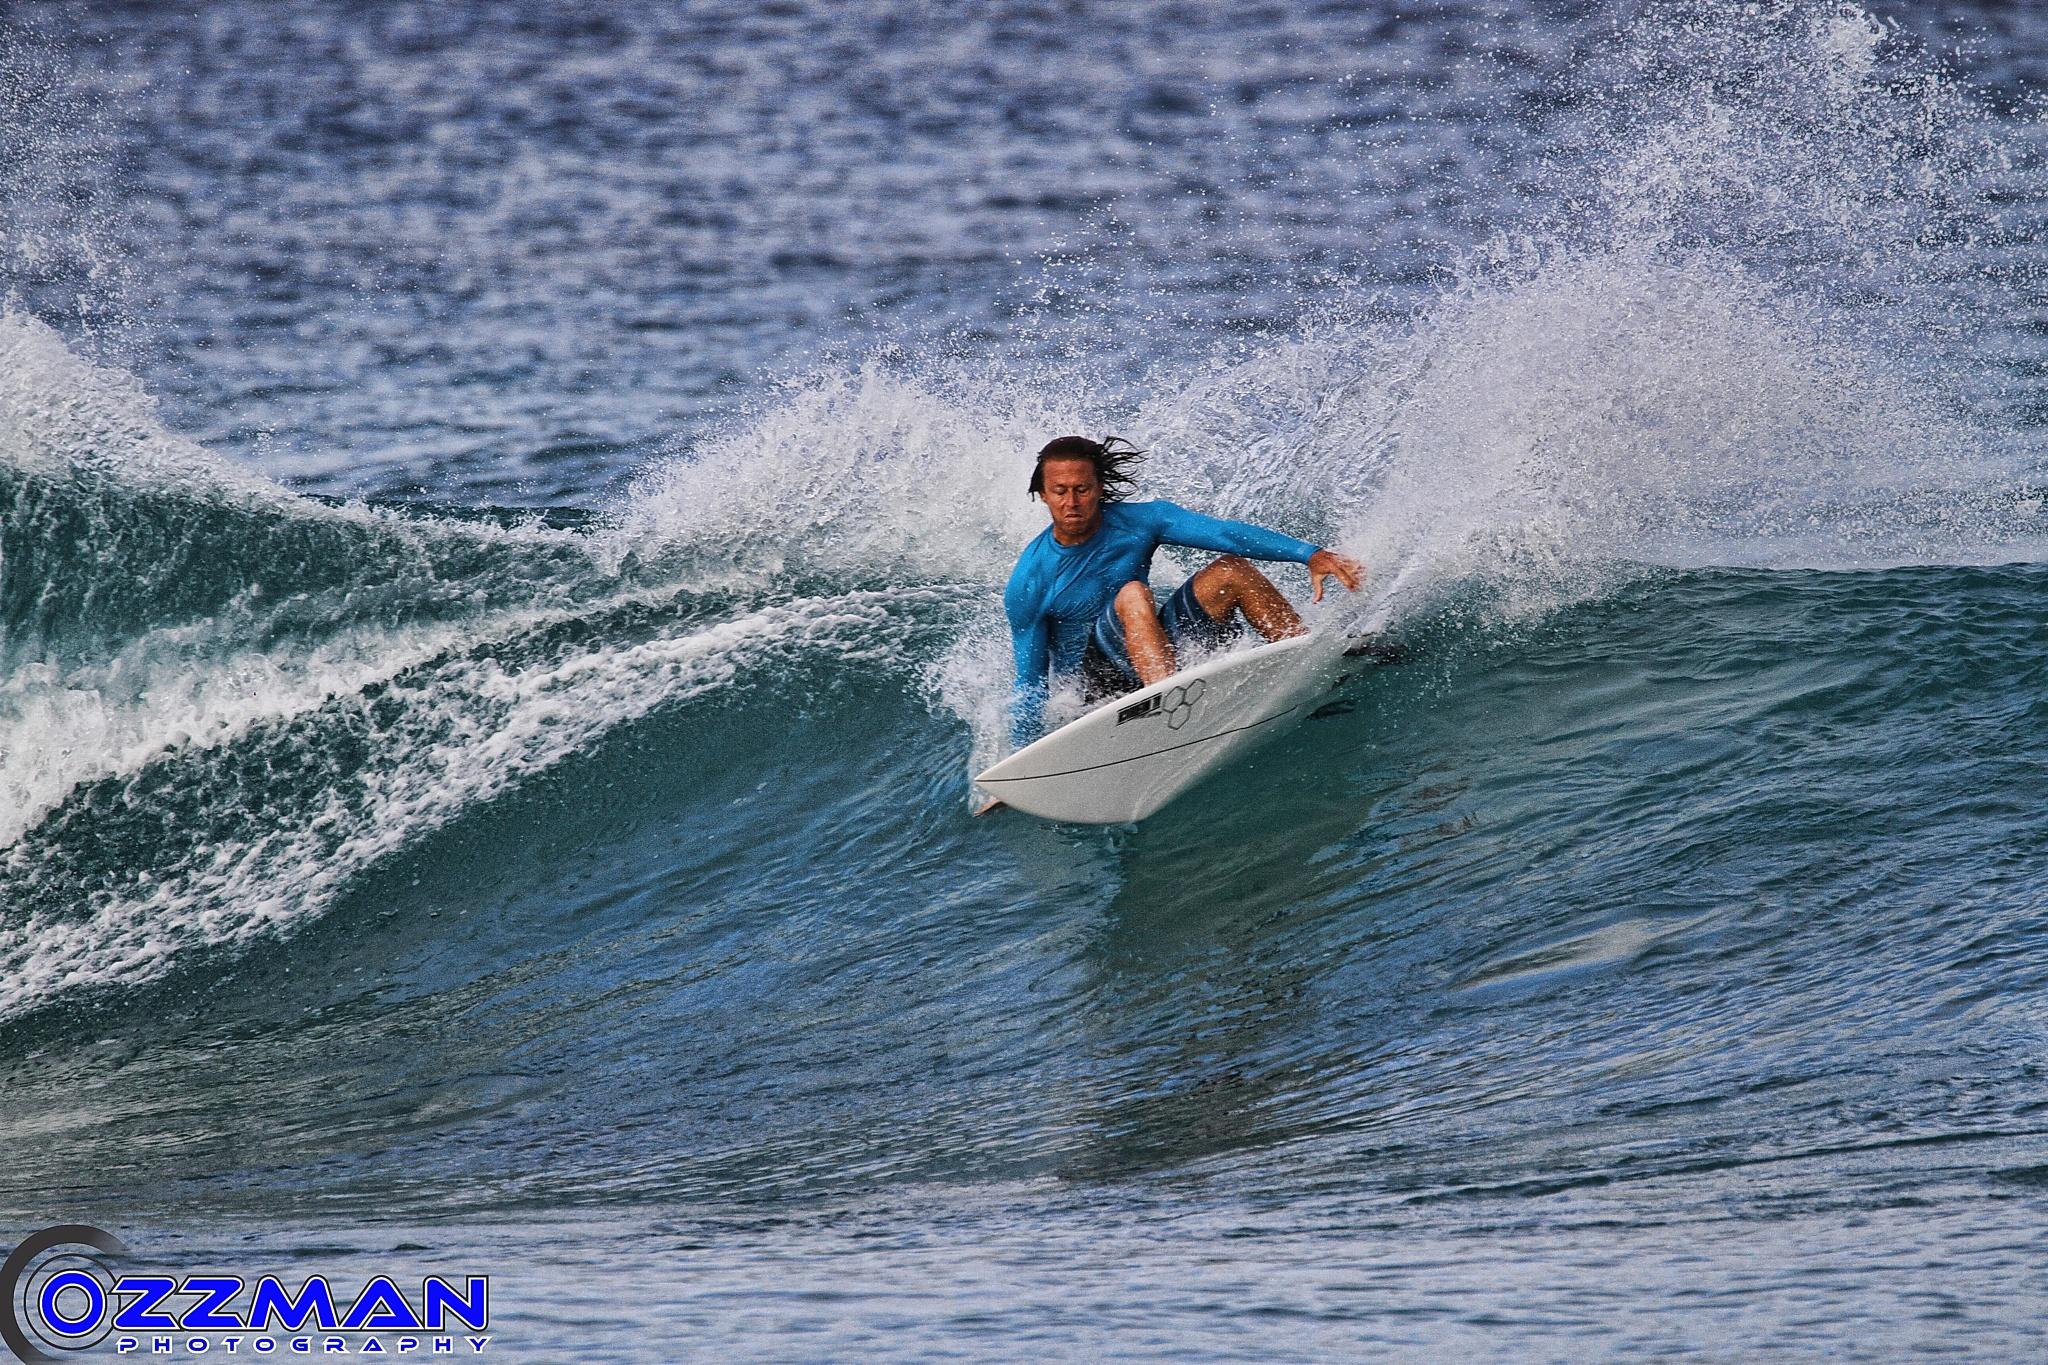 Surfer #3 by Ozzy Osborne